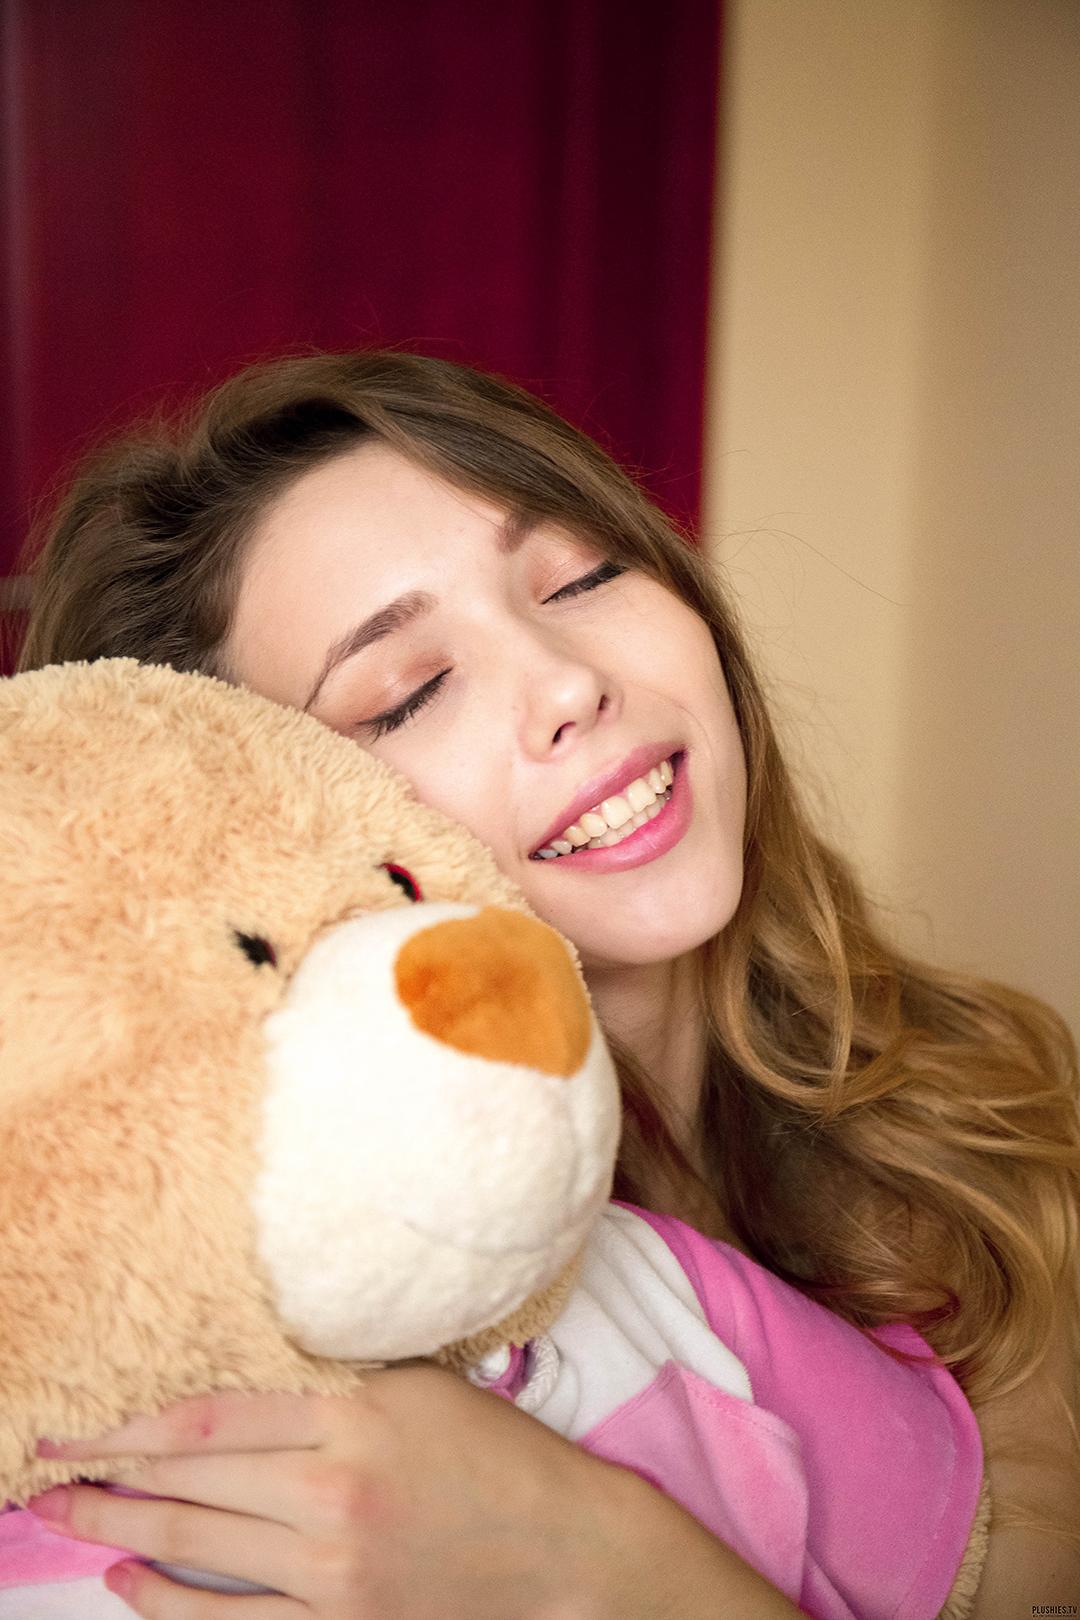 People 1080x1620 Mila Azul women smiling Toy closed eyes women indoors portrait display teddy bears pornstar ekaterina volkova